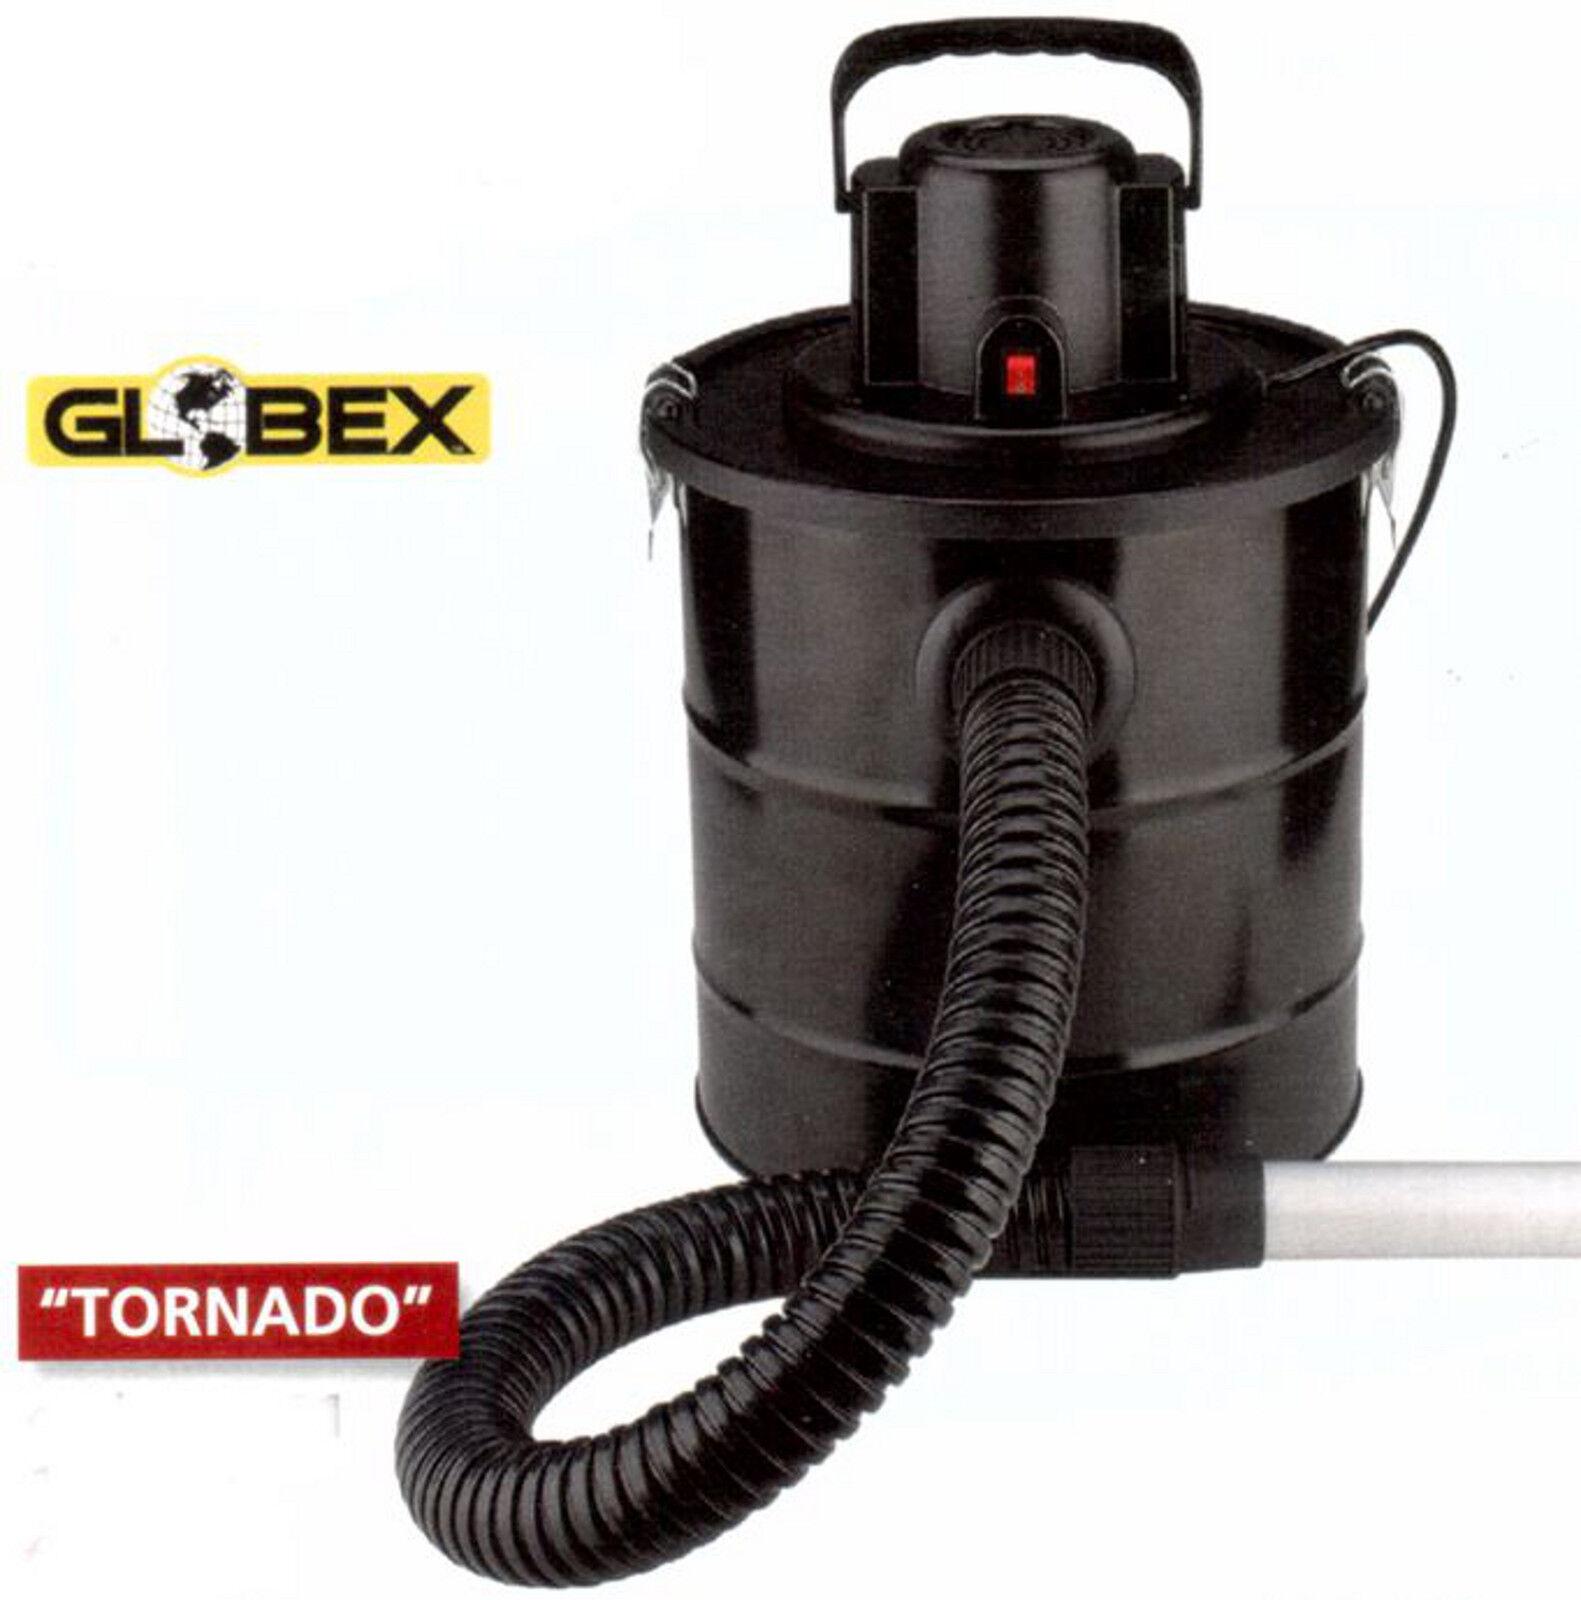 Bidone aspiracenere aspira cenere polvere Globex Tornado HEPA 18 lt 1200 W